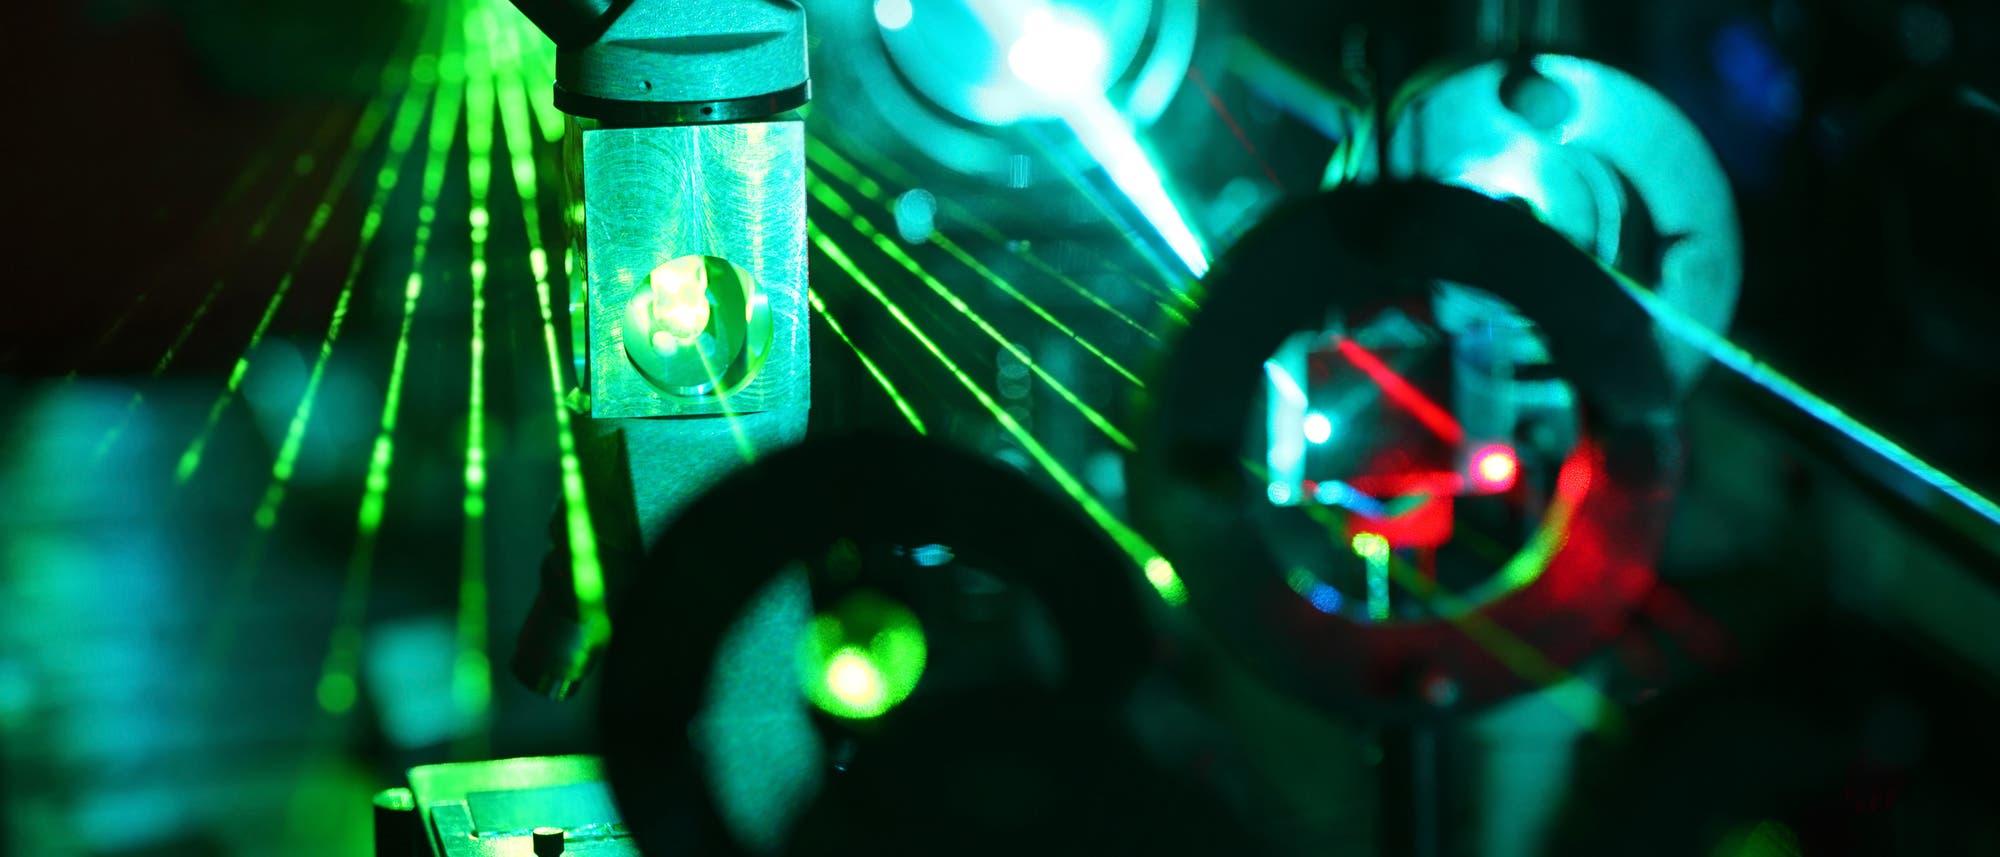 Forschung an einem Lasertisch